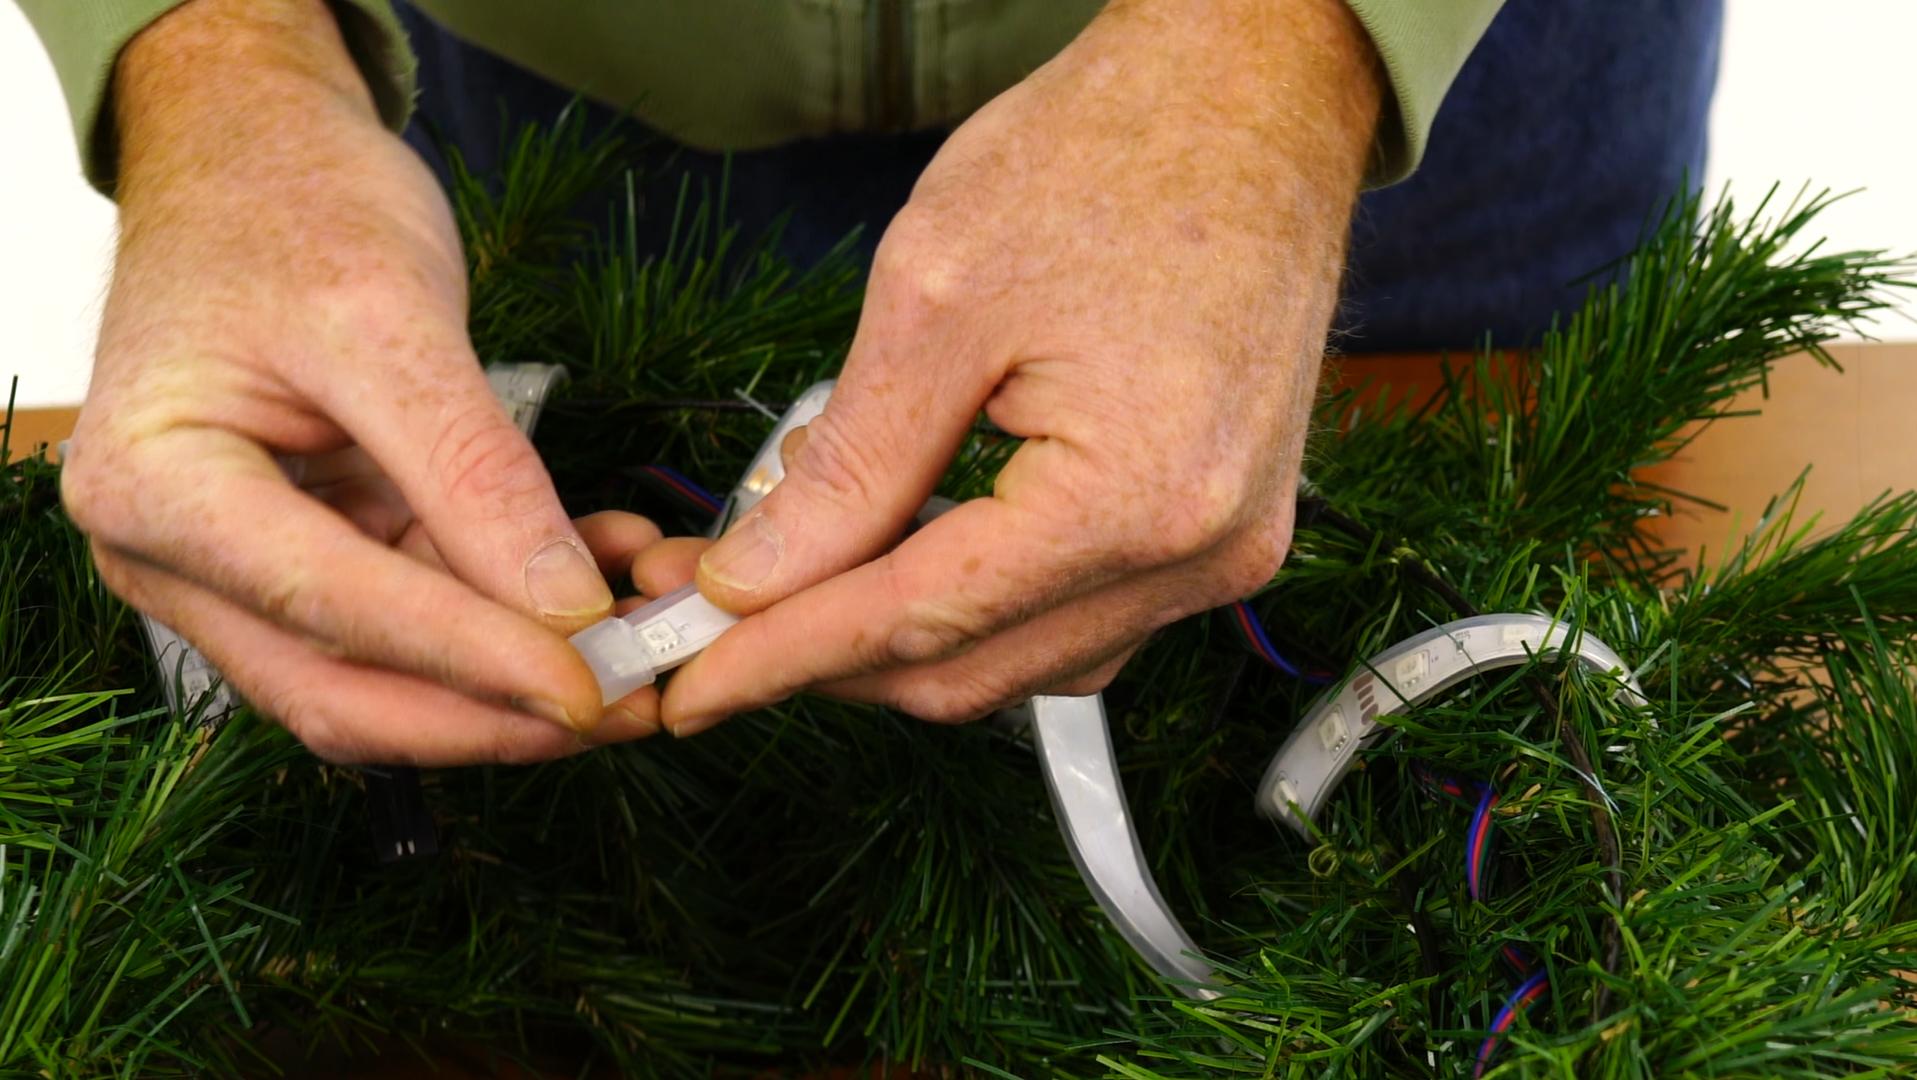 DIY Christmas wreath step 3 end cap